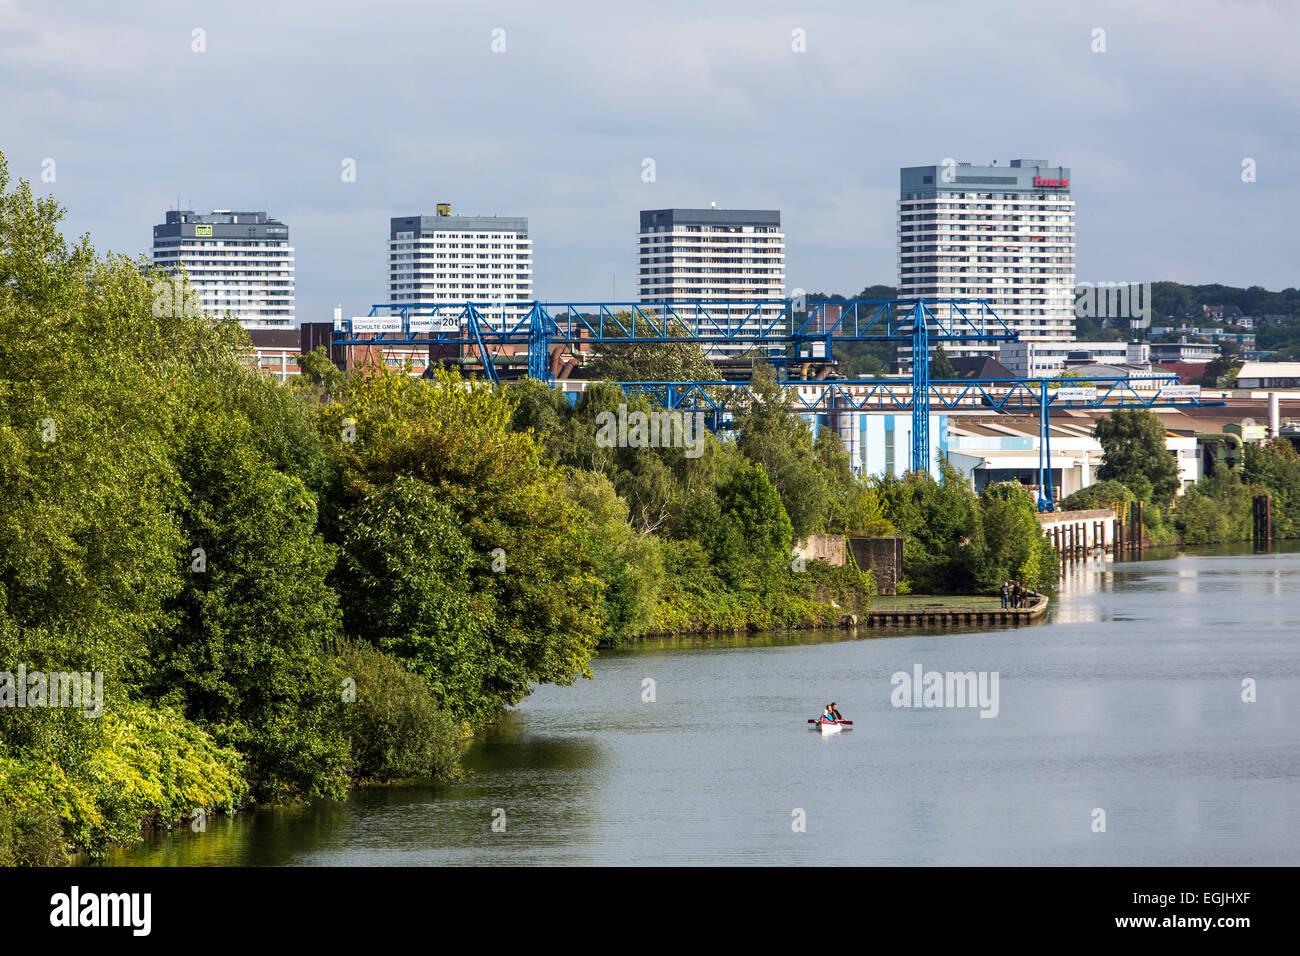 Skyline, Muelheim, river Ruhr - Stock Image